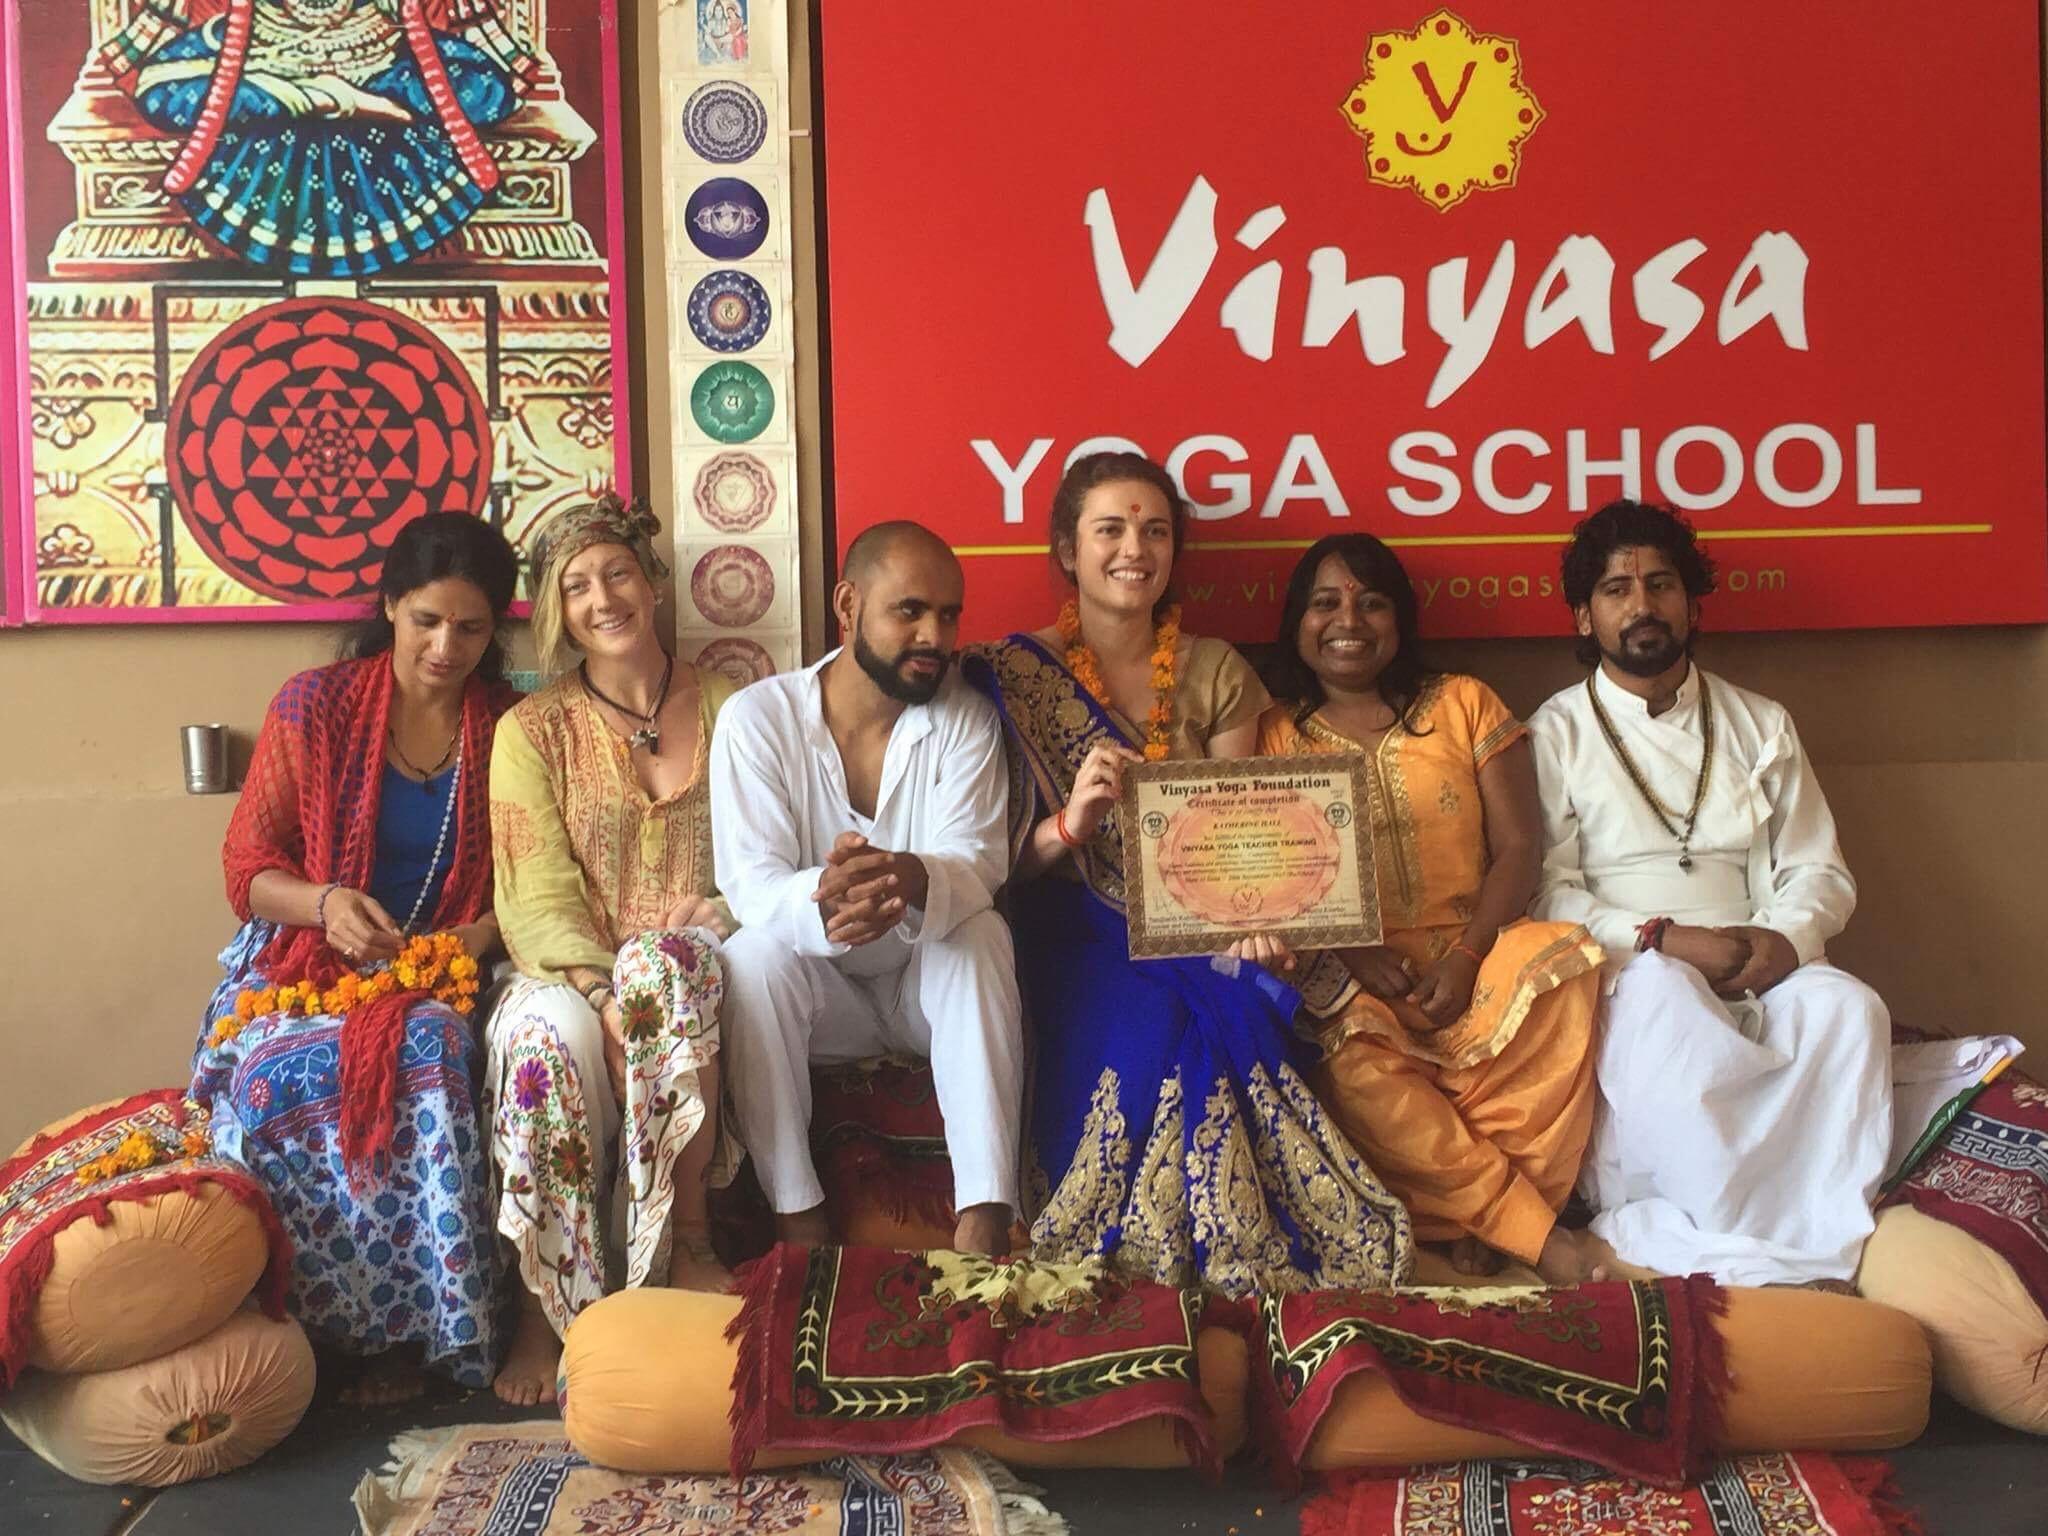 graduation day at yoga school. left to right: sarita, katie, deepak, me, pamelA and mandeep